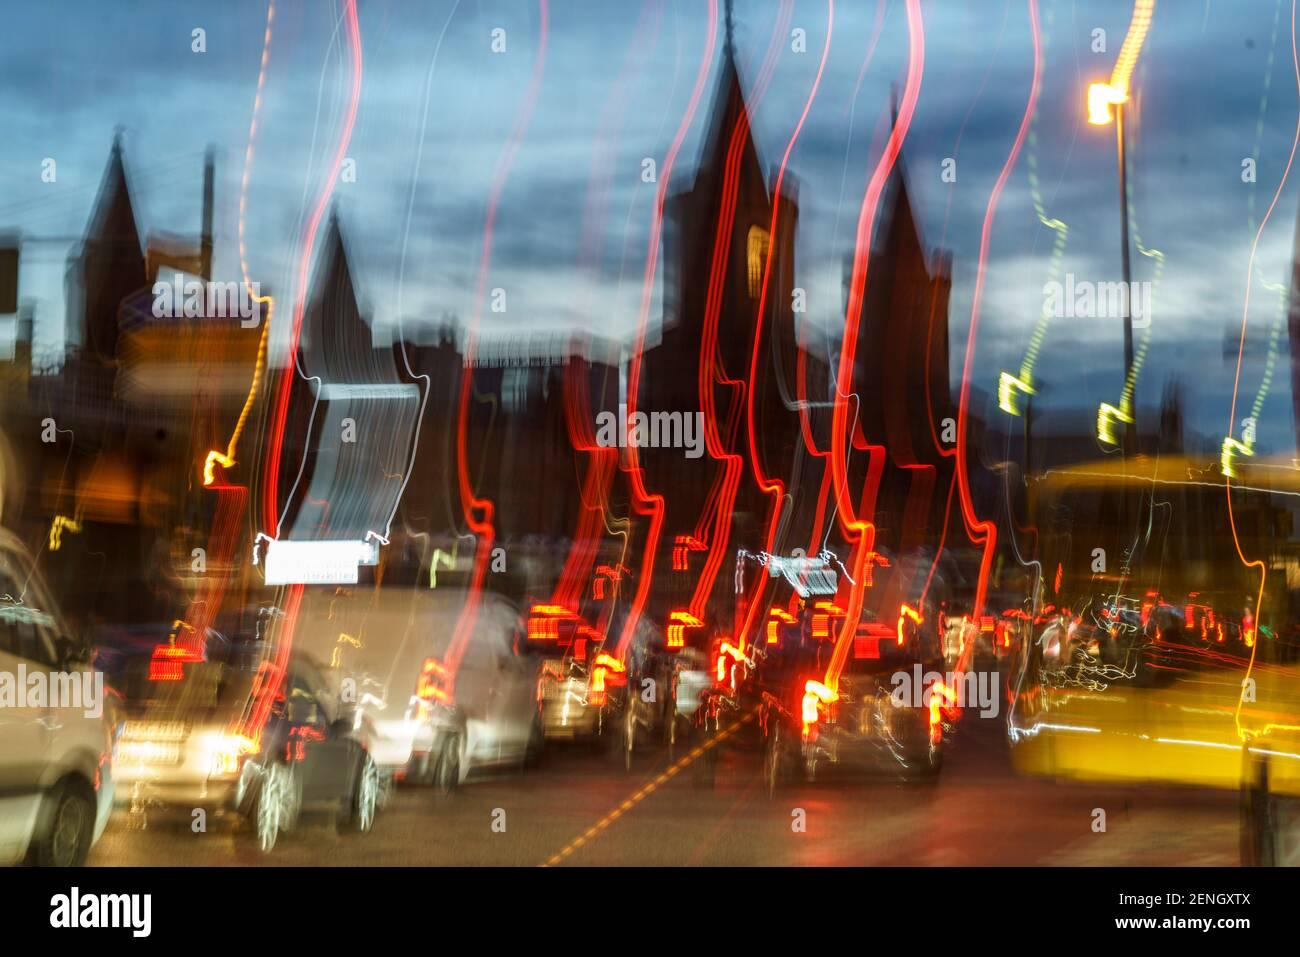 Oberbaumbruecke, Verkehrschaos, Stau, hora punta, verwischt, Schienenersatzverkehr U1, U3, Berlín Foto de stock